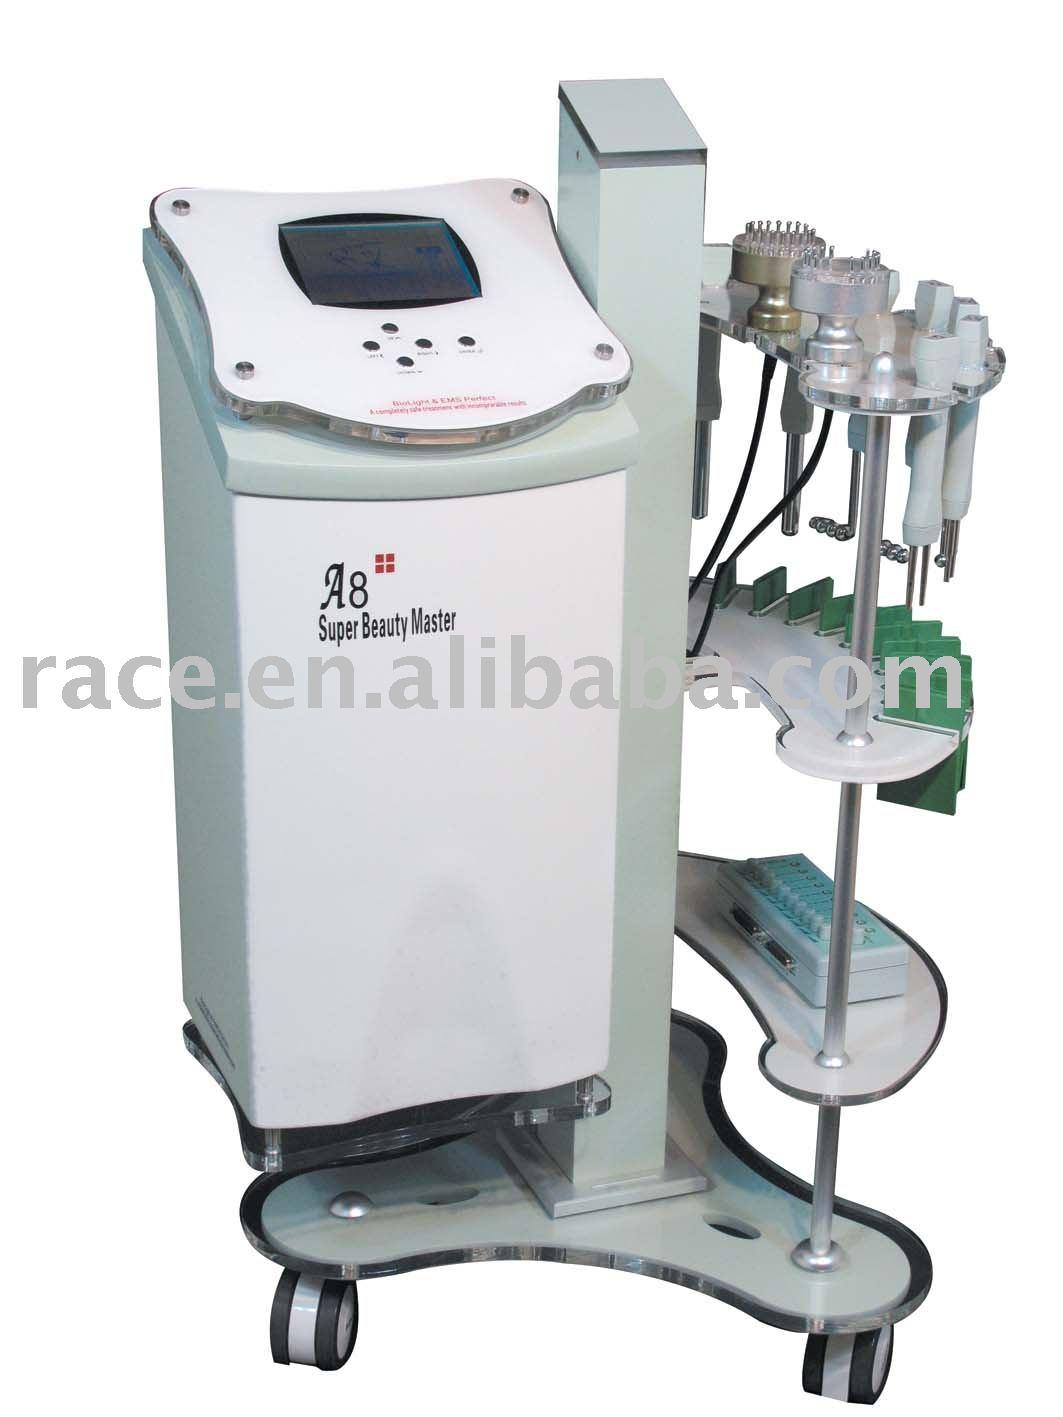 ... EMS bio skin care machine